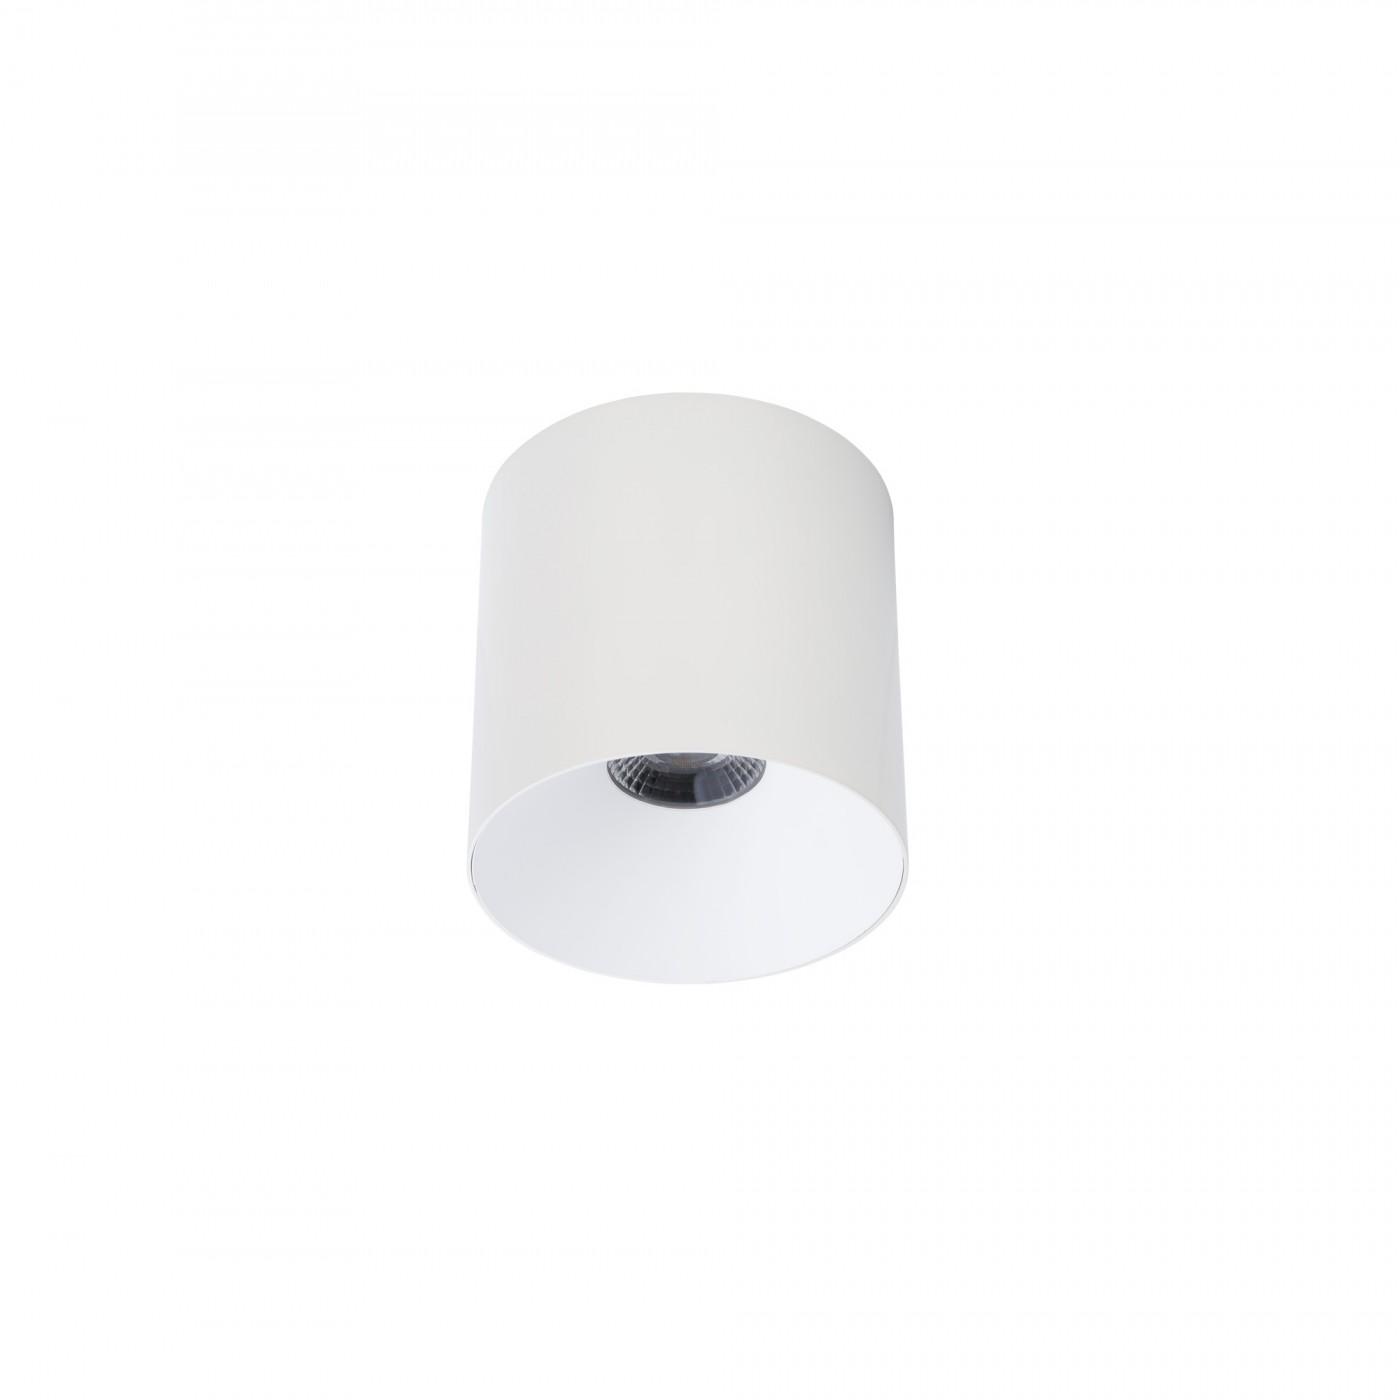 CL IOS LED 20W 3000K white 8740 Nowodvorski Lighting